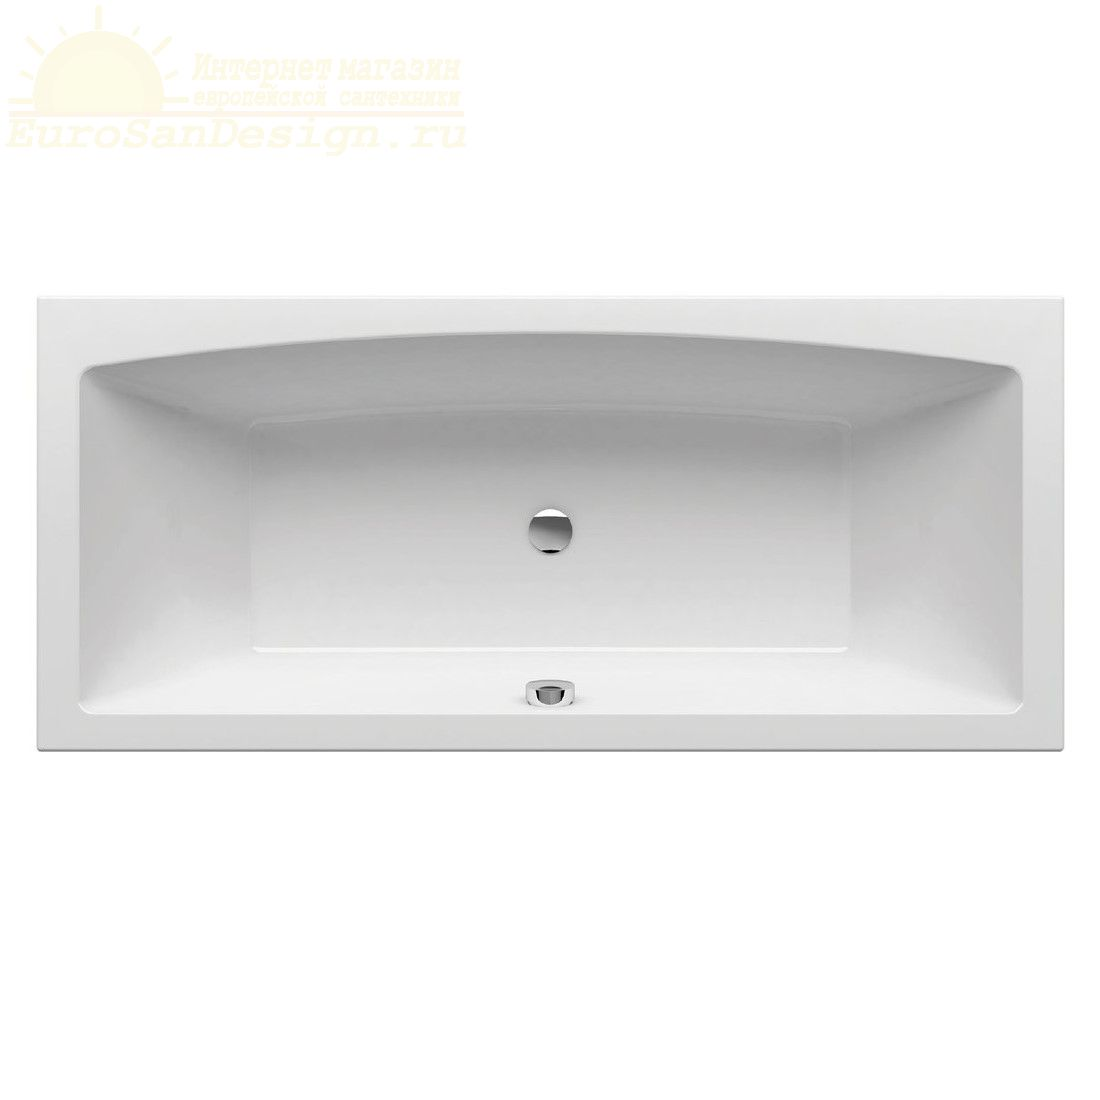 Прямоугольная ванна Ravak Formy 02 180x80 ФОТО